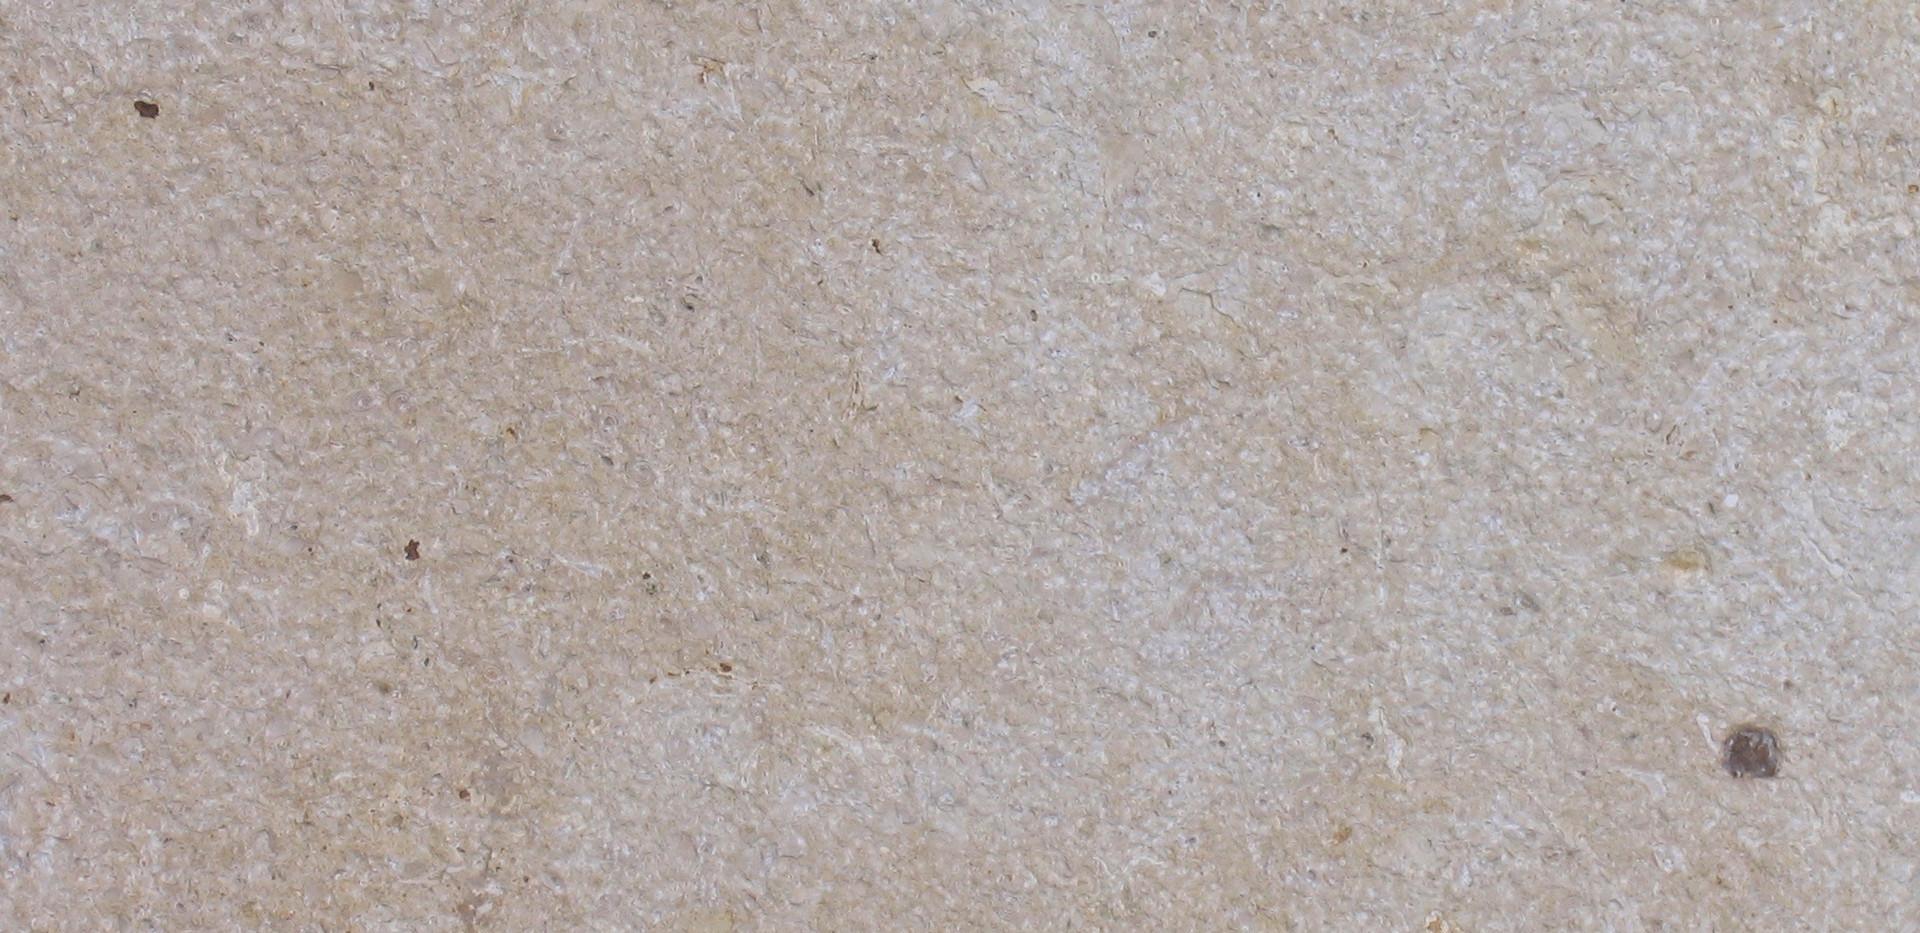 12-Giallo-Dorato-bocciarda-marmo.jpg